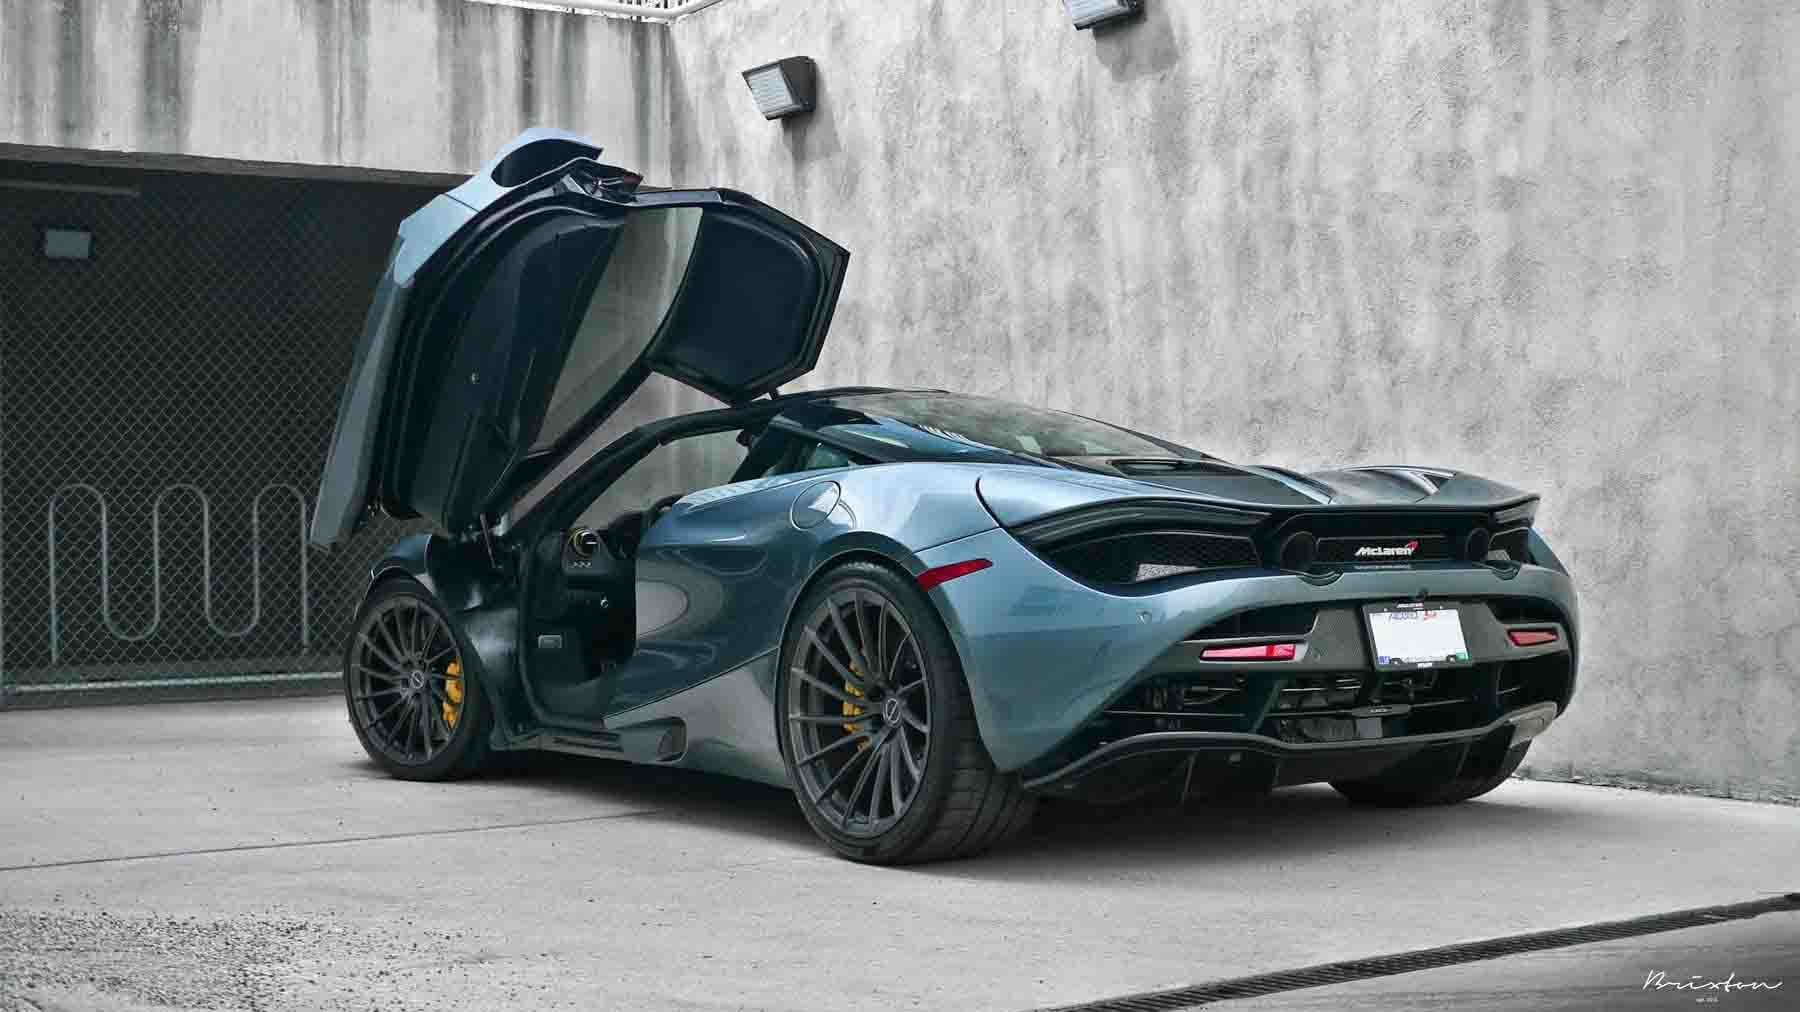 images-products-1-2934-232975222-polaris-blue-mclaren-720s-performance-brixton-forged-wheels-r15-ultrasport-1-piece-concave-brush.jpg